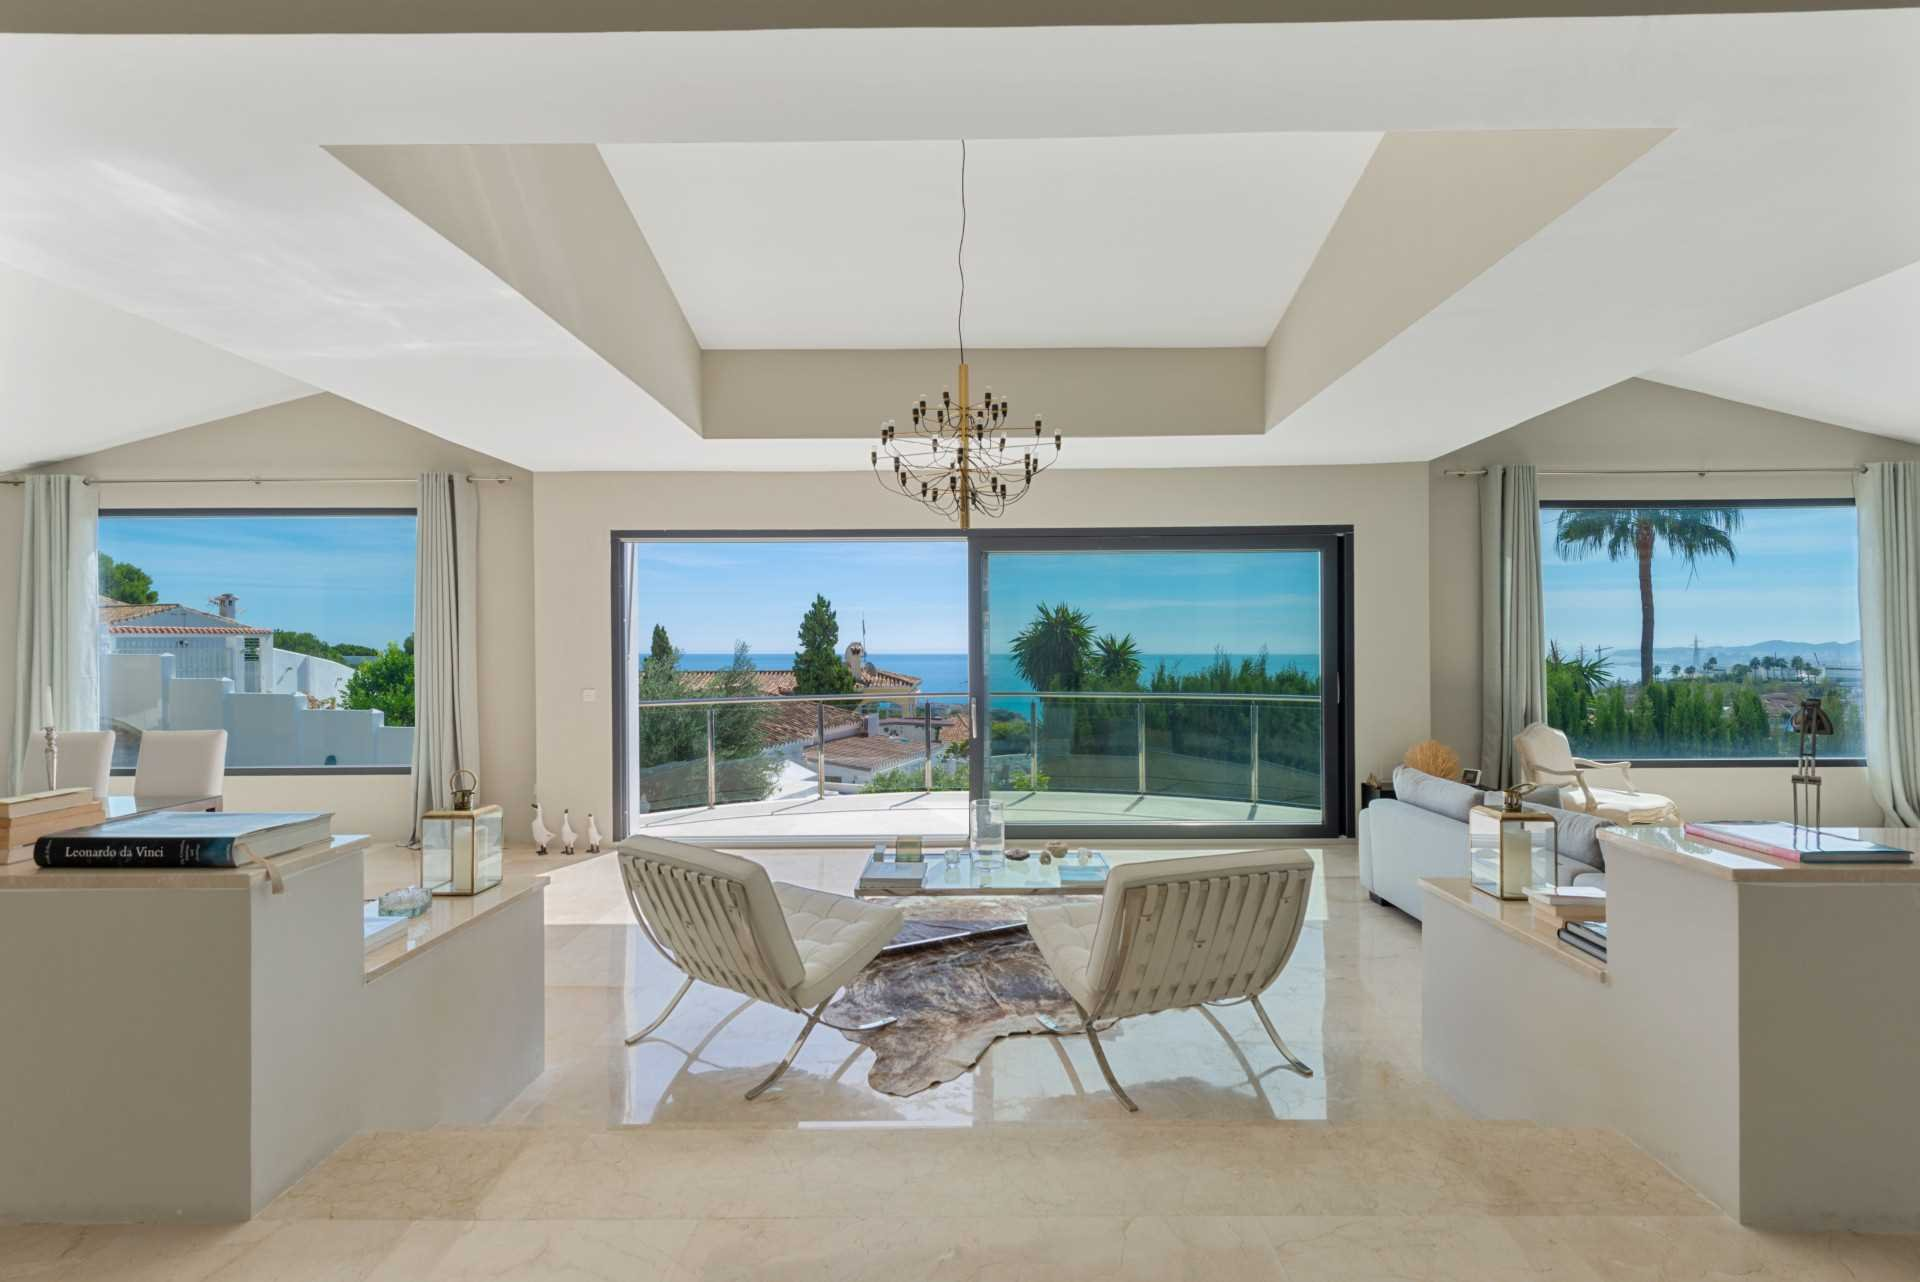 Villa in Benalmádena, Andalusia, Spain 1 - 11390373